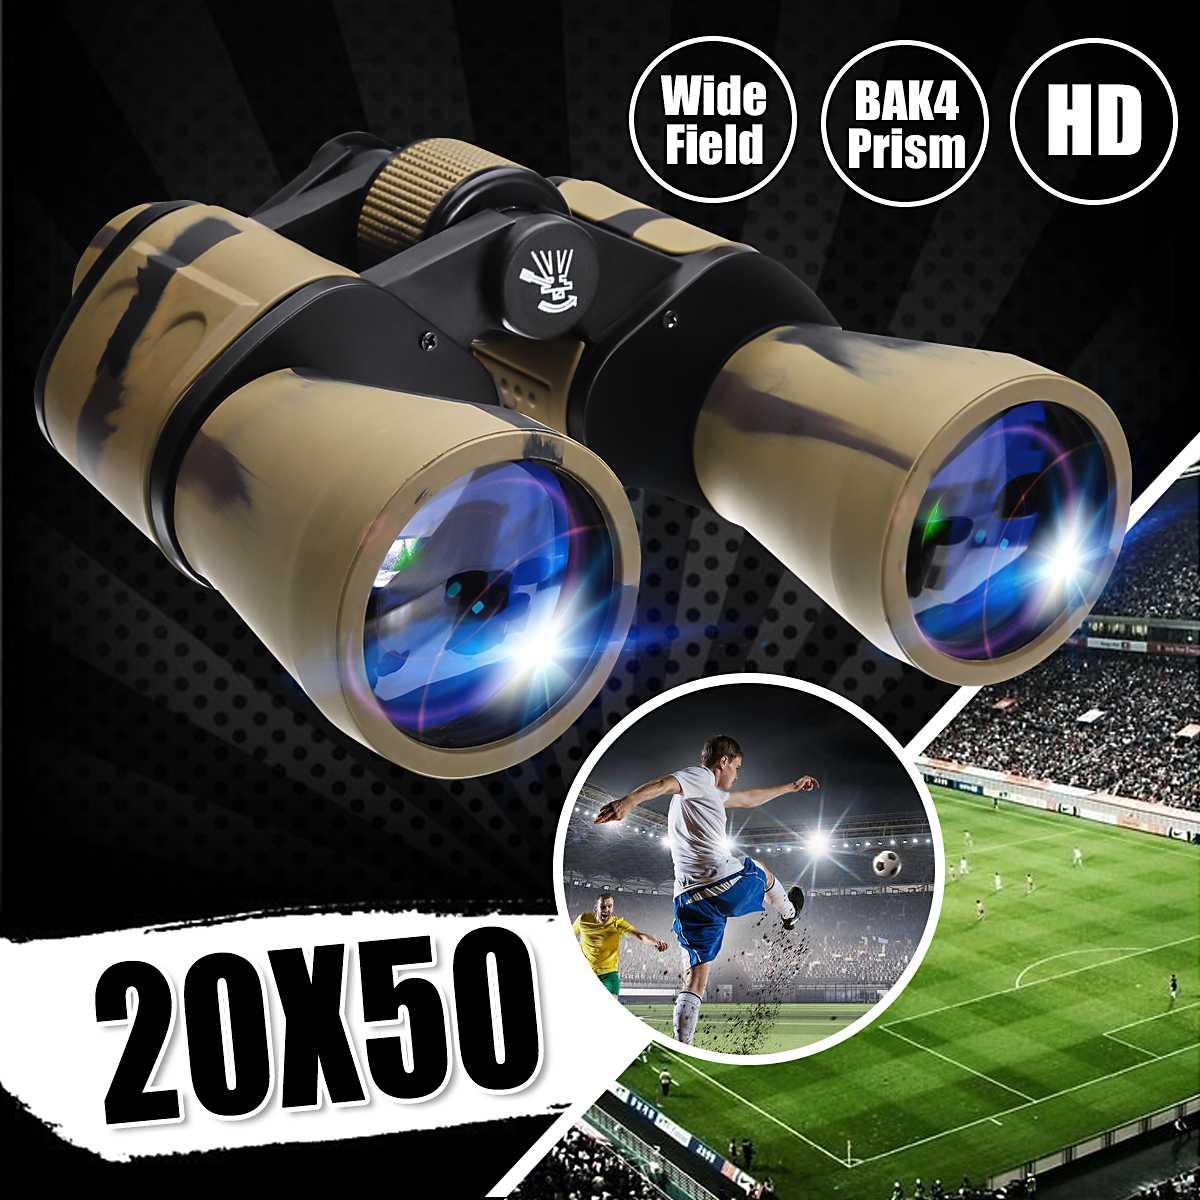 20x50 High Clarity Binoculars Powerful Military binocular For Outdoor Hunting Optical glass Hd Telescope low light Night Vision 1